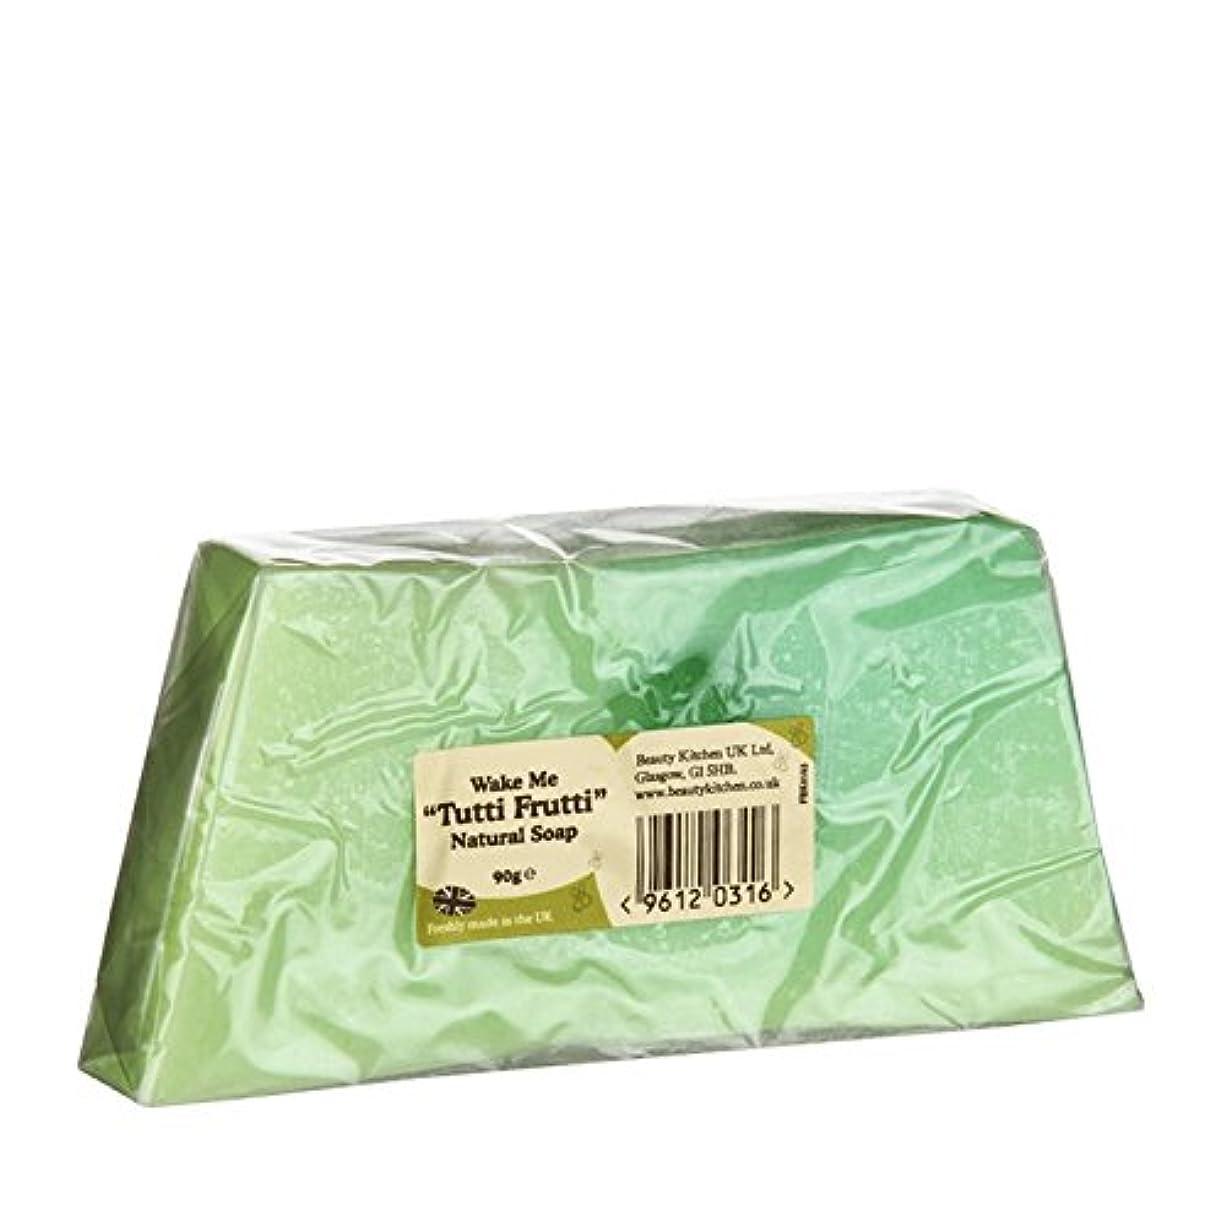 Beauty Kitchen Wake Me Tutti Frutti Natural Soap 90g (Pack of 6) - 美しさのキッチンは私トゥッティフルッティの天然石鹸90グラムウェイク (x6) [並行輸入品]